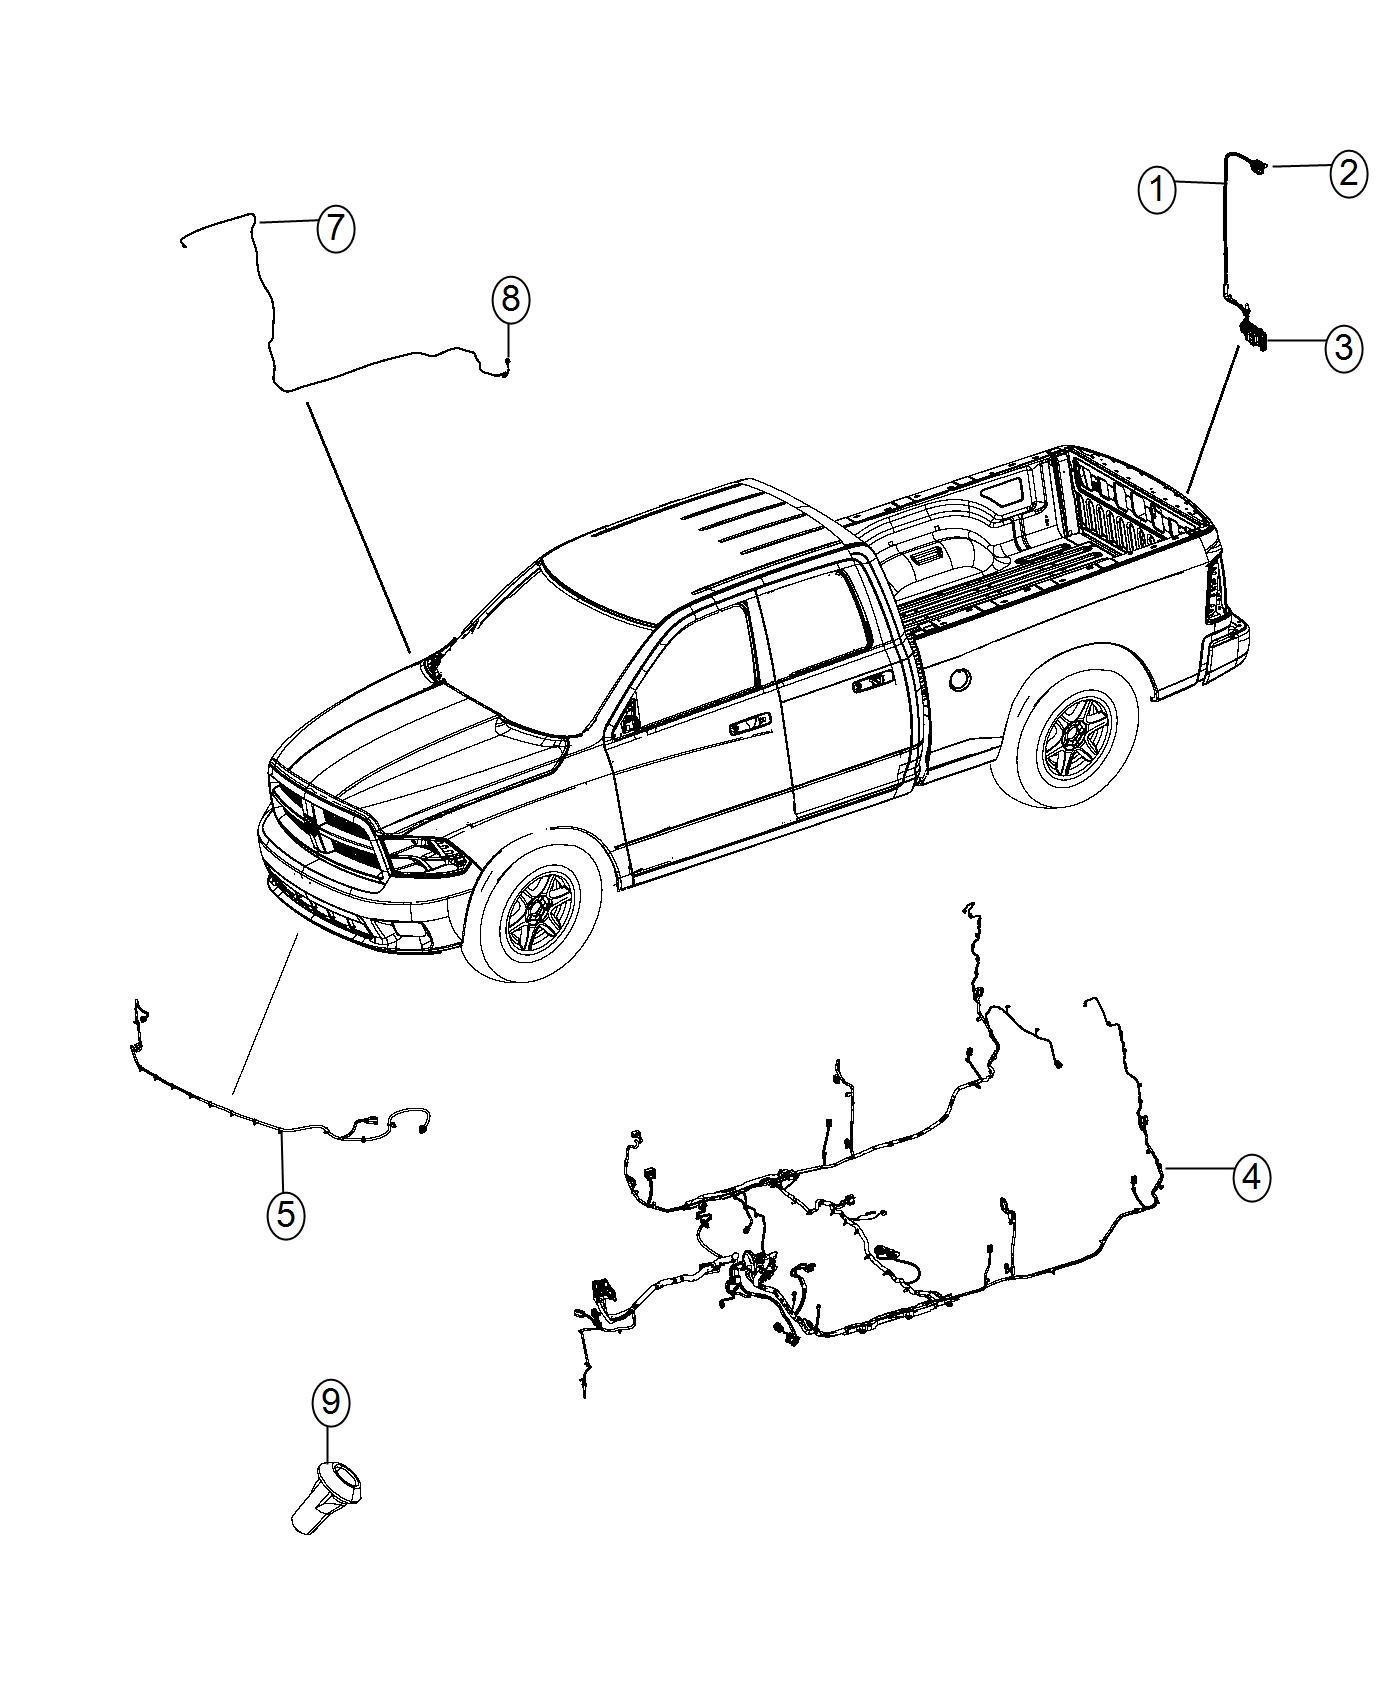 Ram Connector Kit Wiring Tailgate Tailgate Wiring